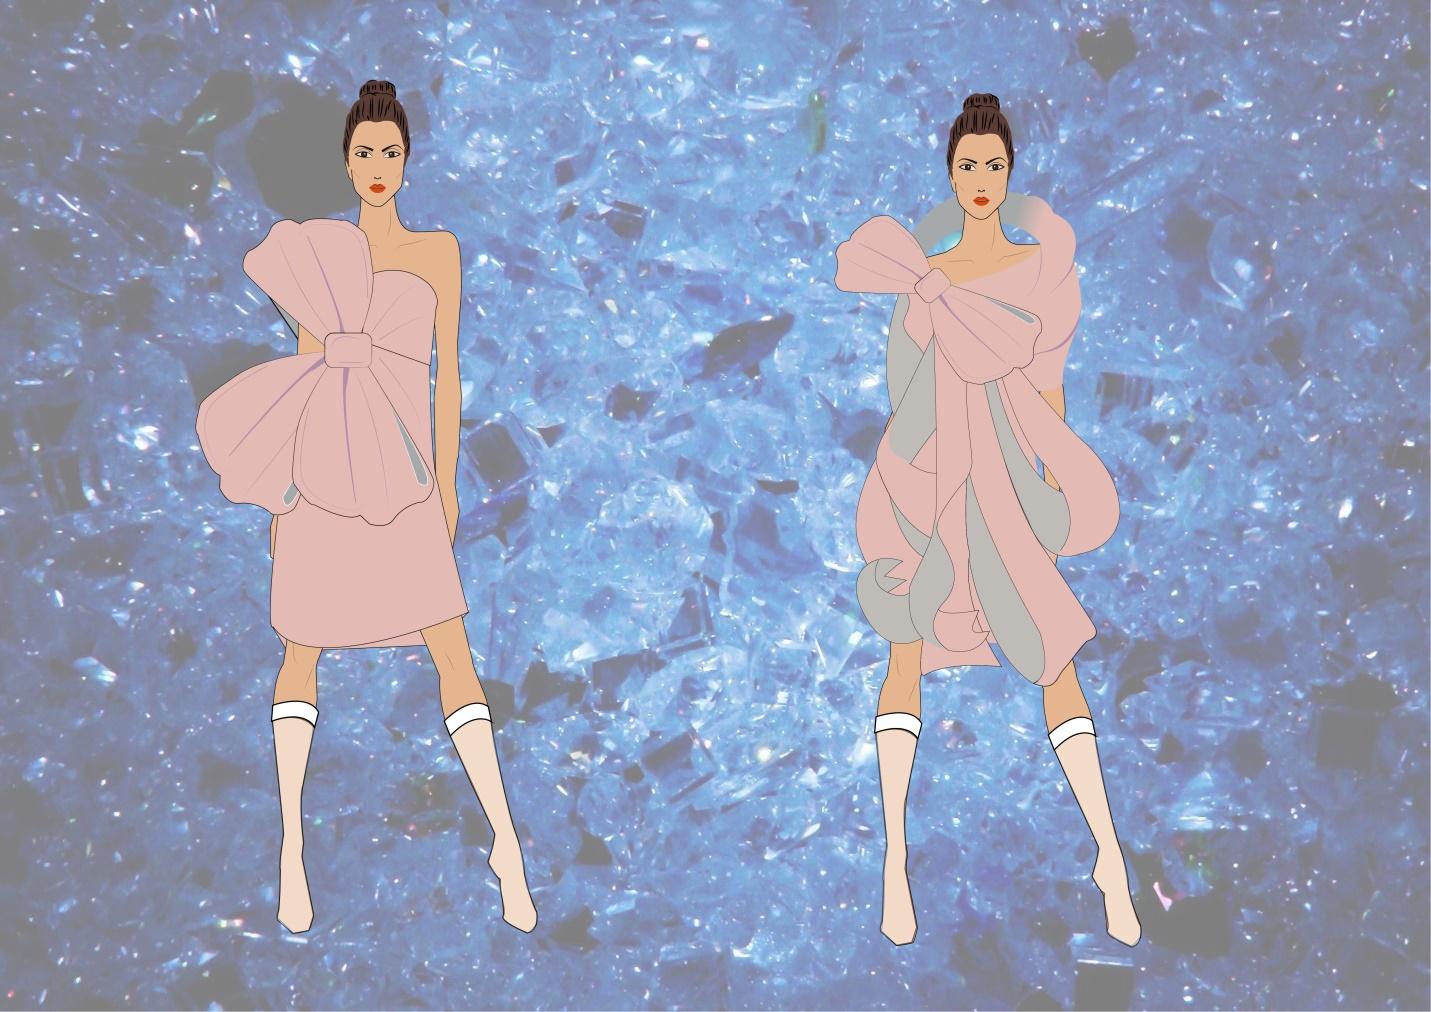 Quintessential Allure quintessential allure - QUINTESSENTIAL ALLURE   JD Annual Design Awards 2019 Fashion Design 8 - QUINTESSENTIAL ALLURE–JD Annual Design Awards 2019 | Fashion Design